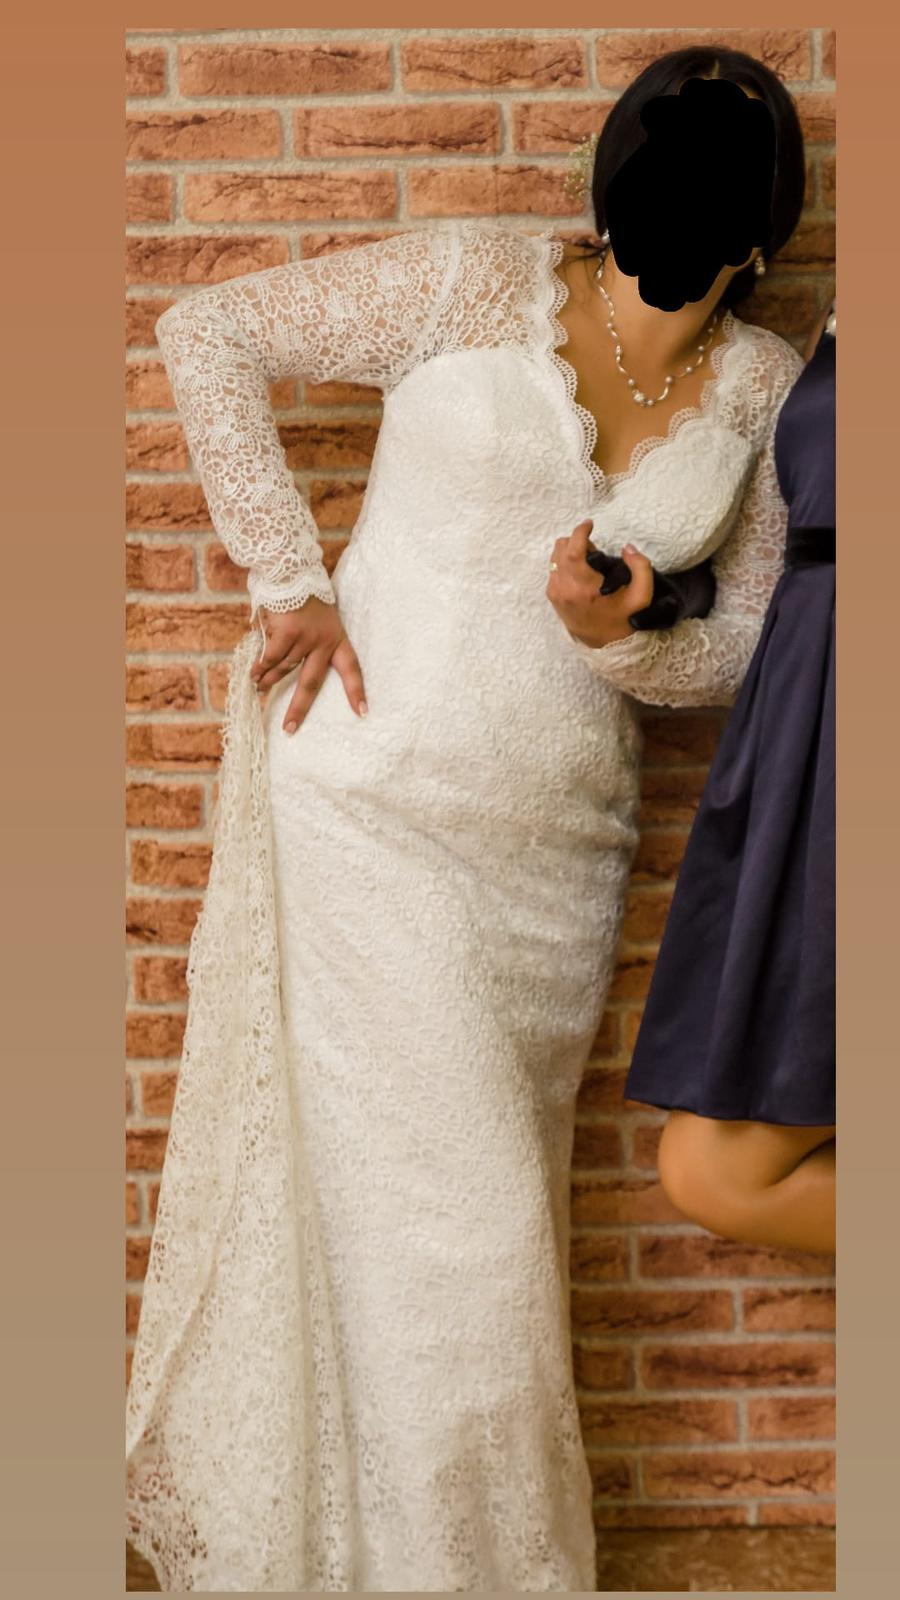 Čipkované svadobné šaty s vlečkou. - Obrázok č. 1